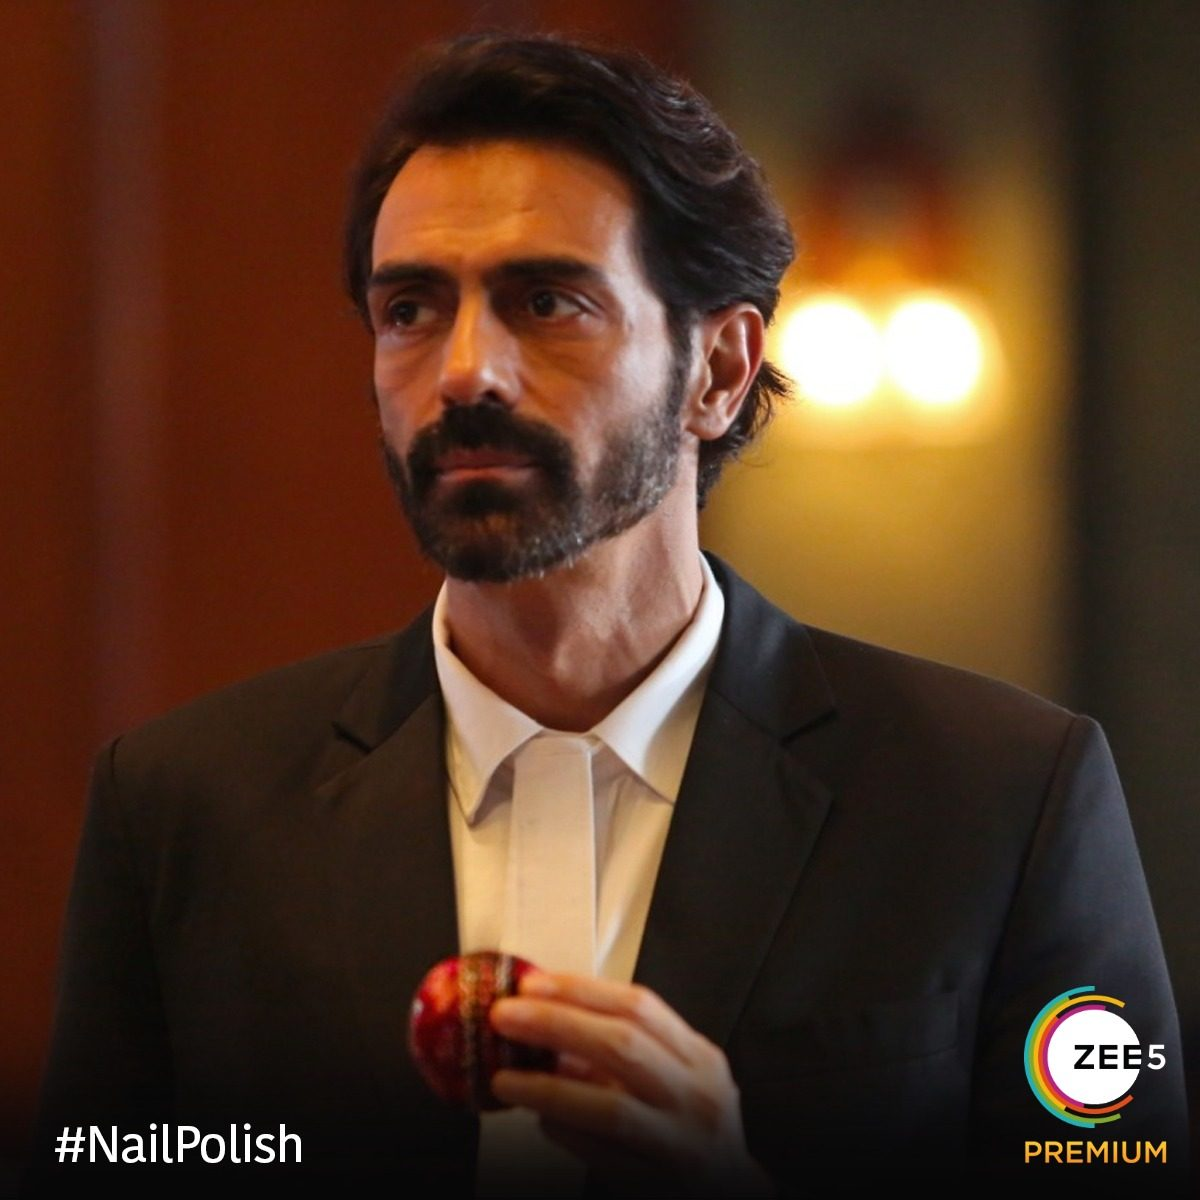 Arjun-Rampal - Nail Polish